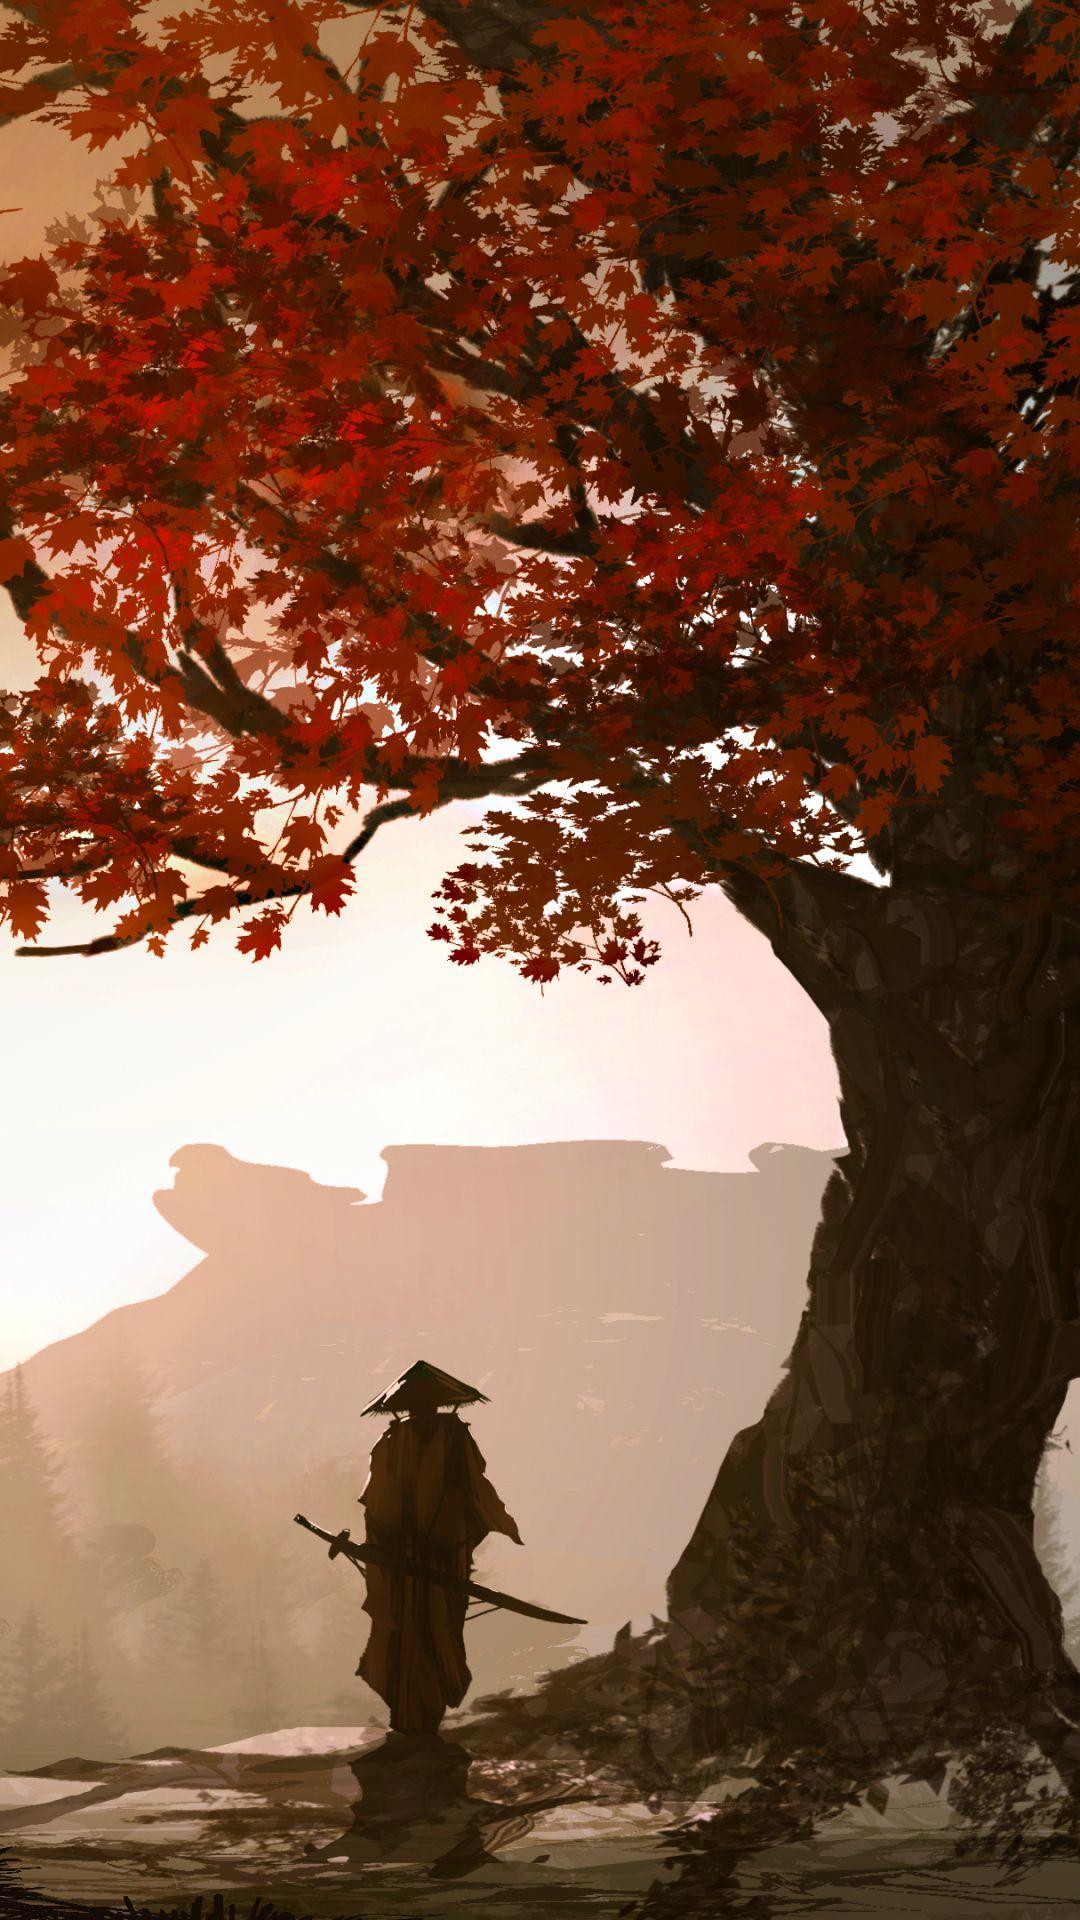 Samurai iPhone Wallpapers - Top Free Samurai iPhone ...